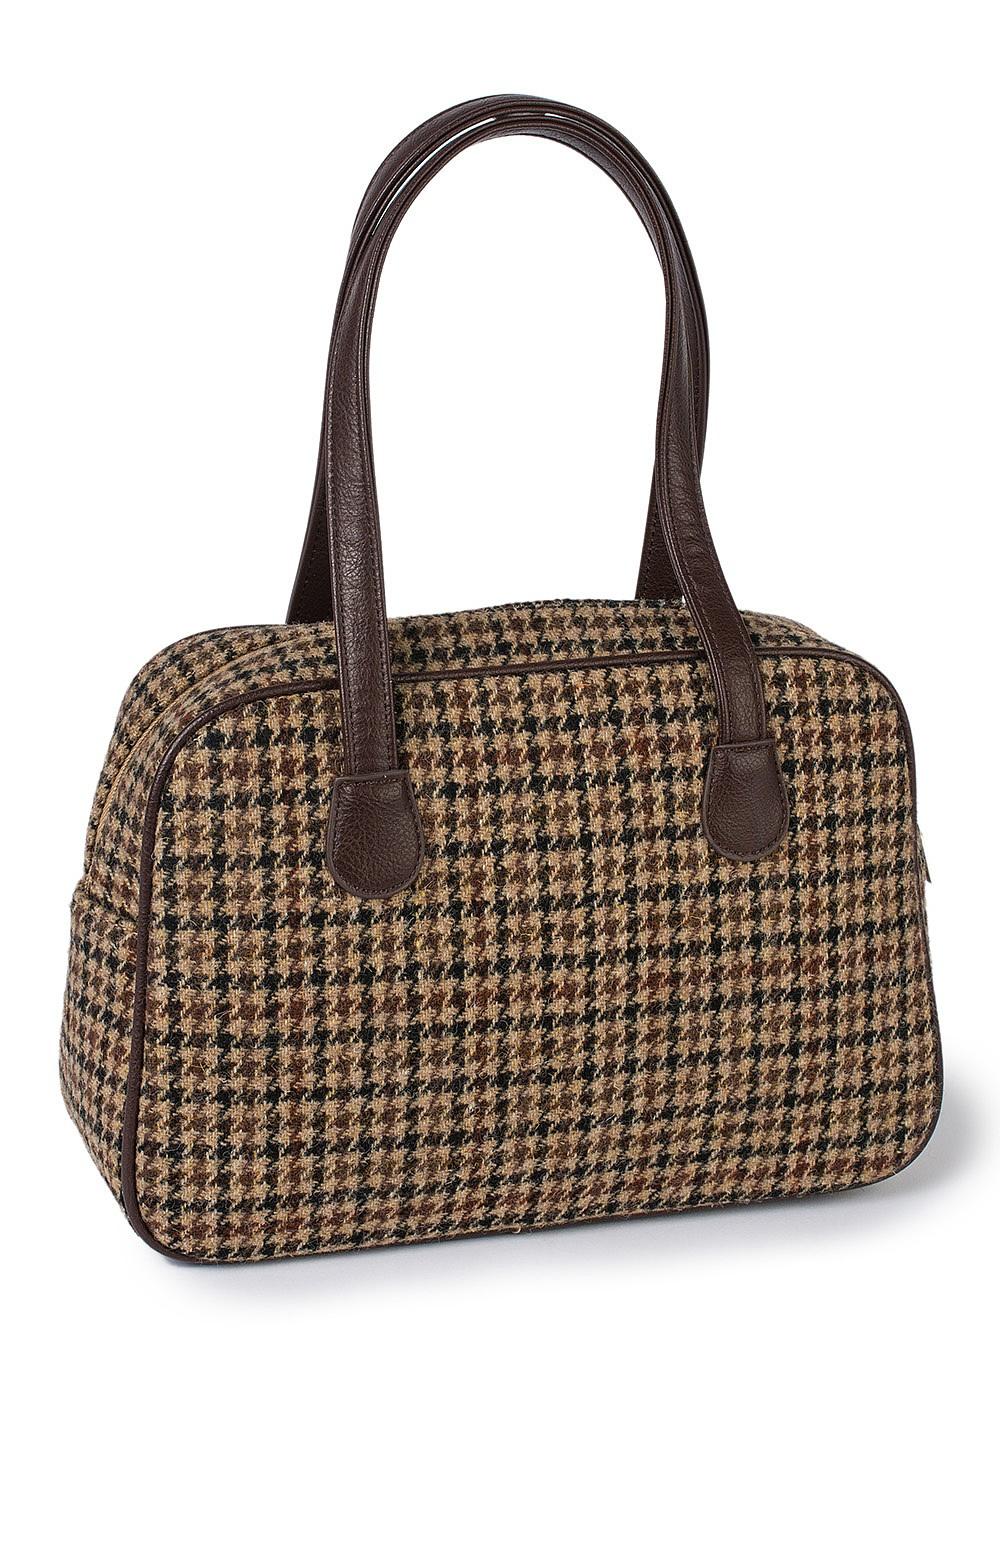 Harris Tweed Square Handbag